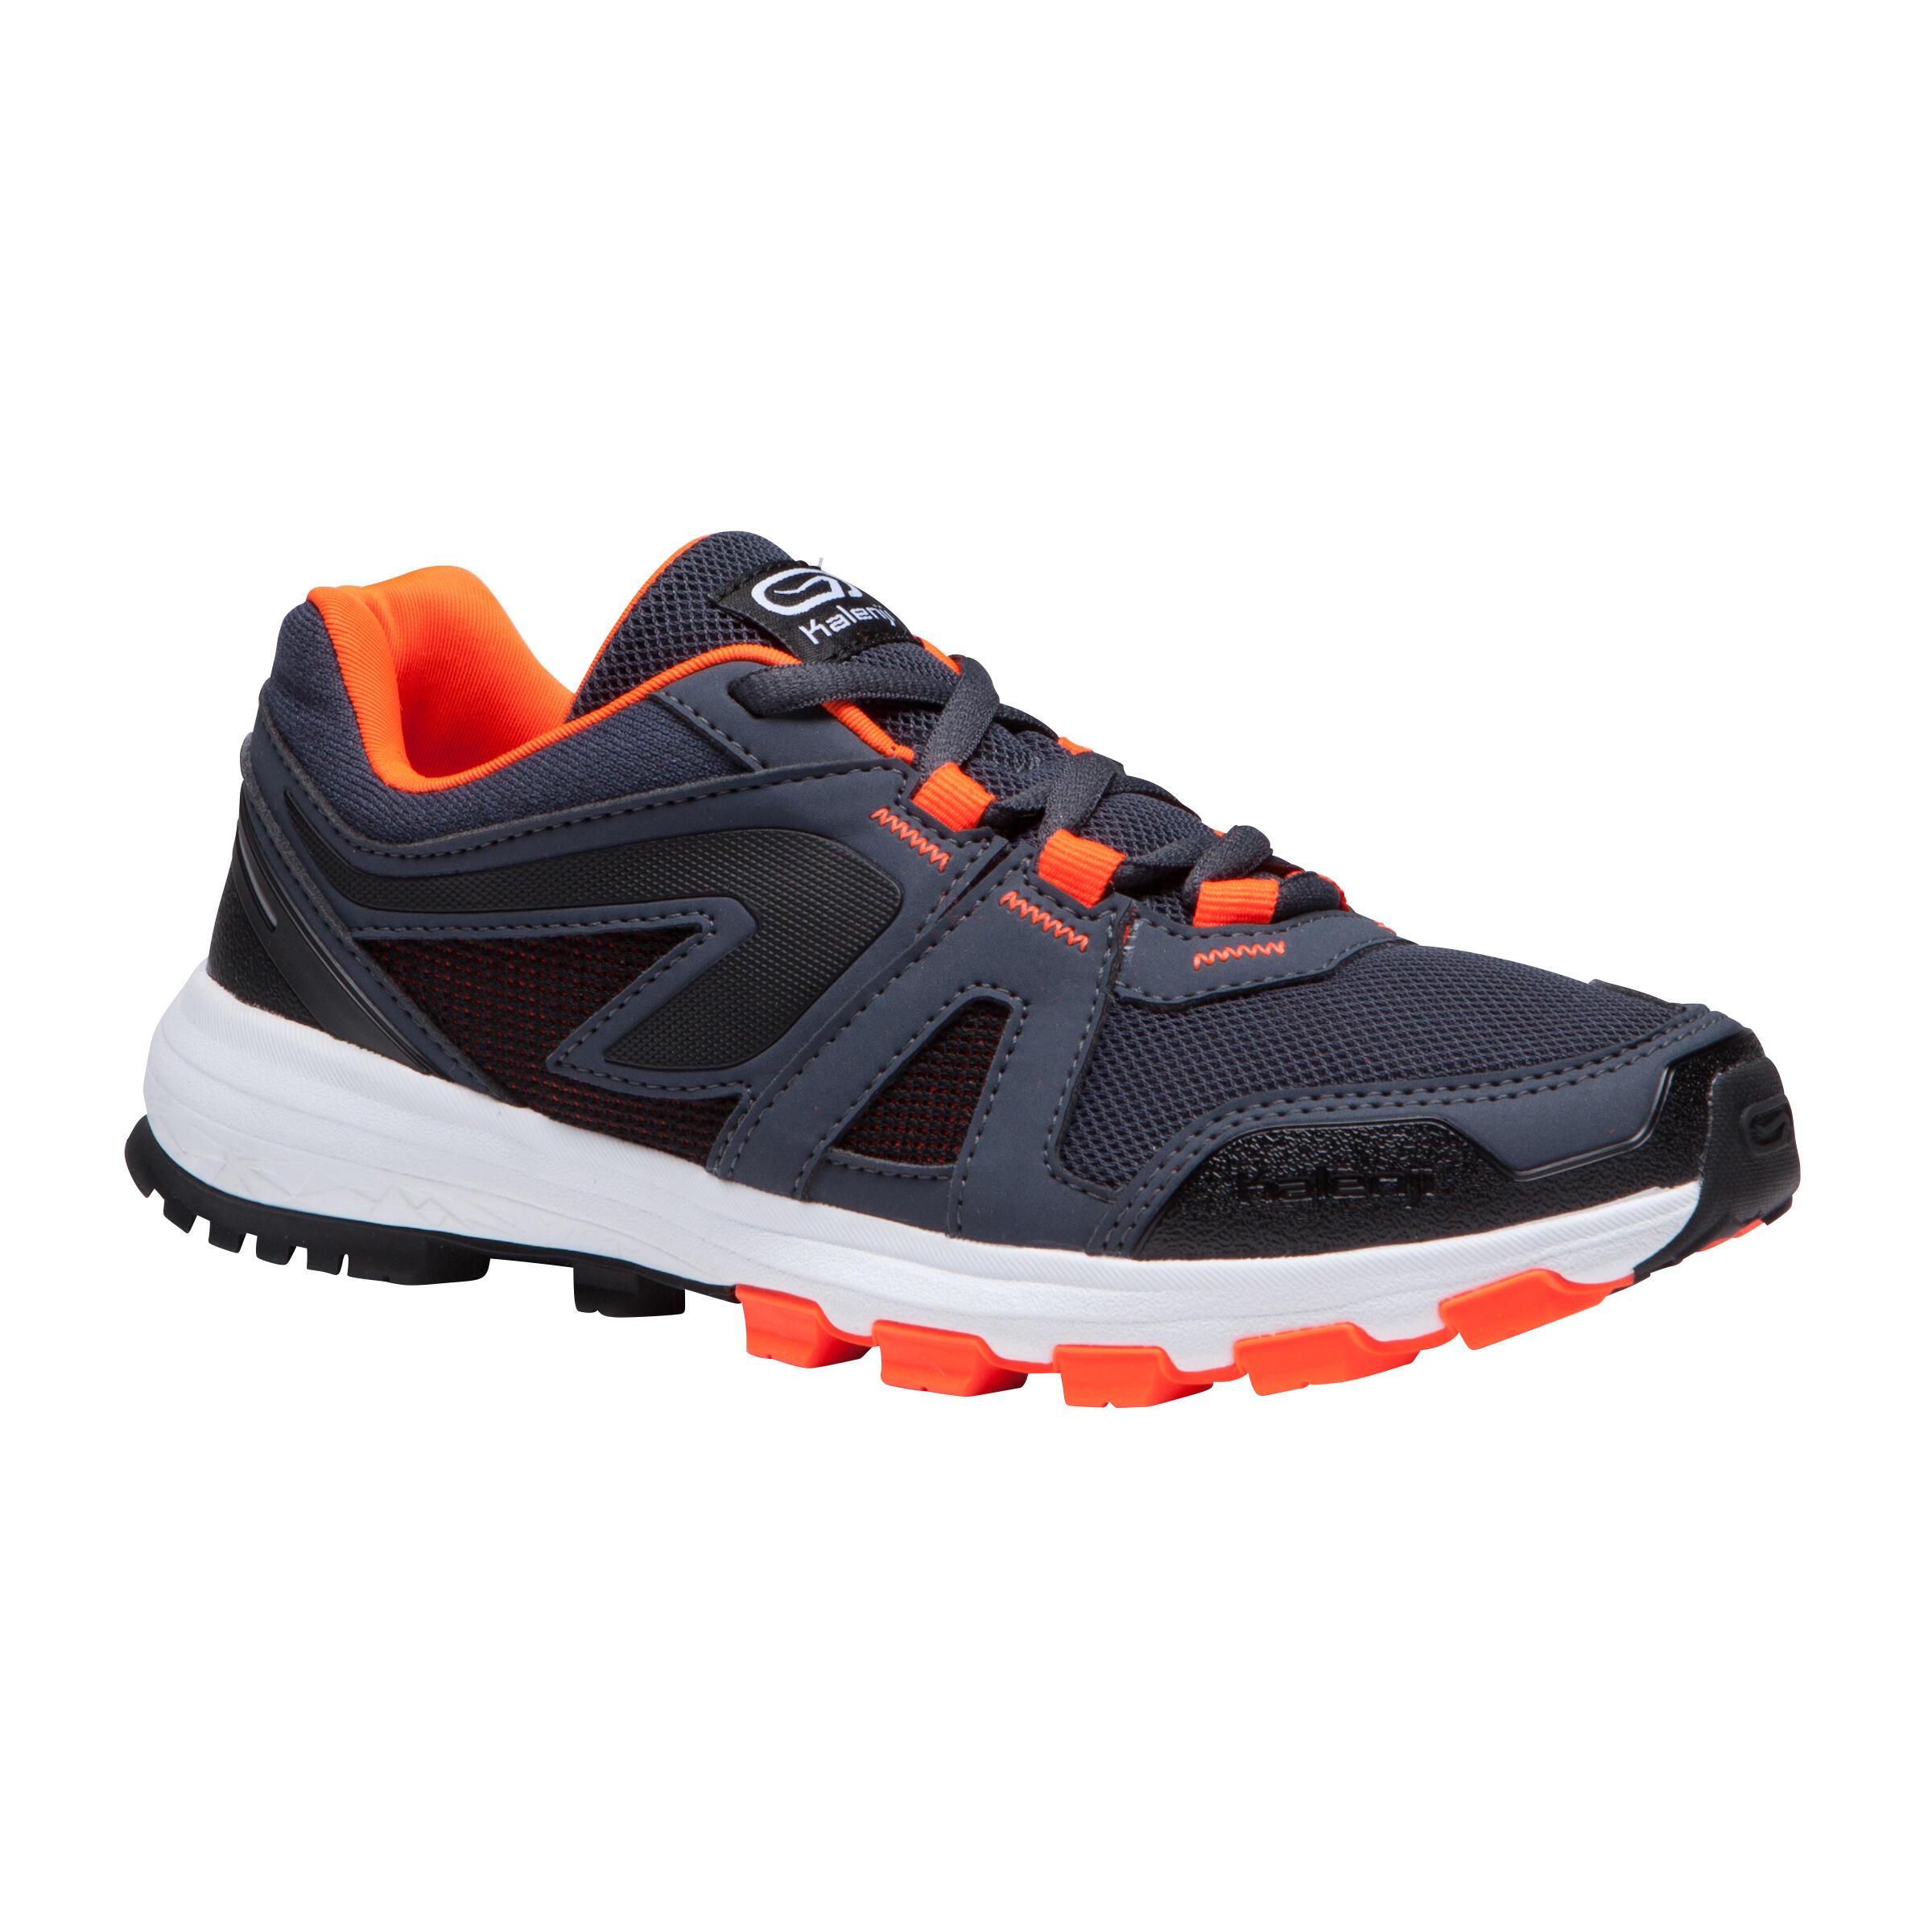 Laufschuhe Leichtathletik Kiprun Grip Kinder grau/schwarz/neonorange